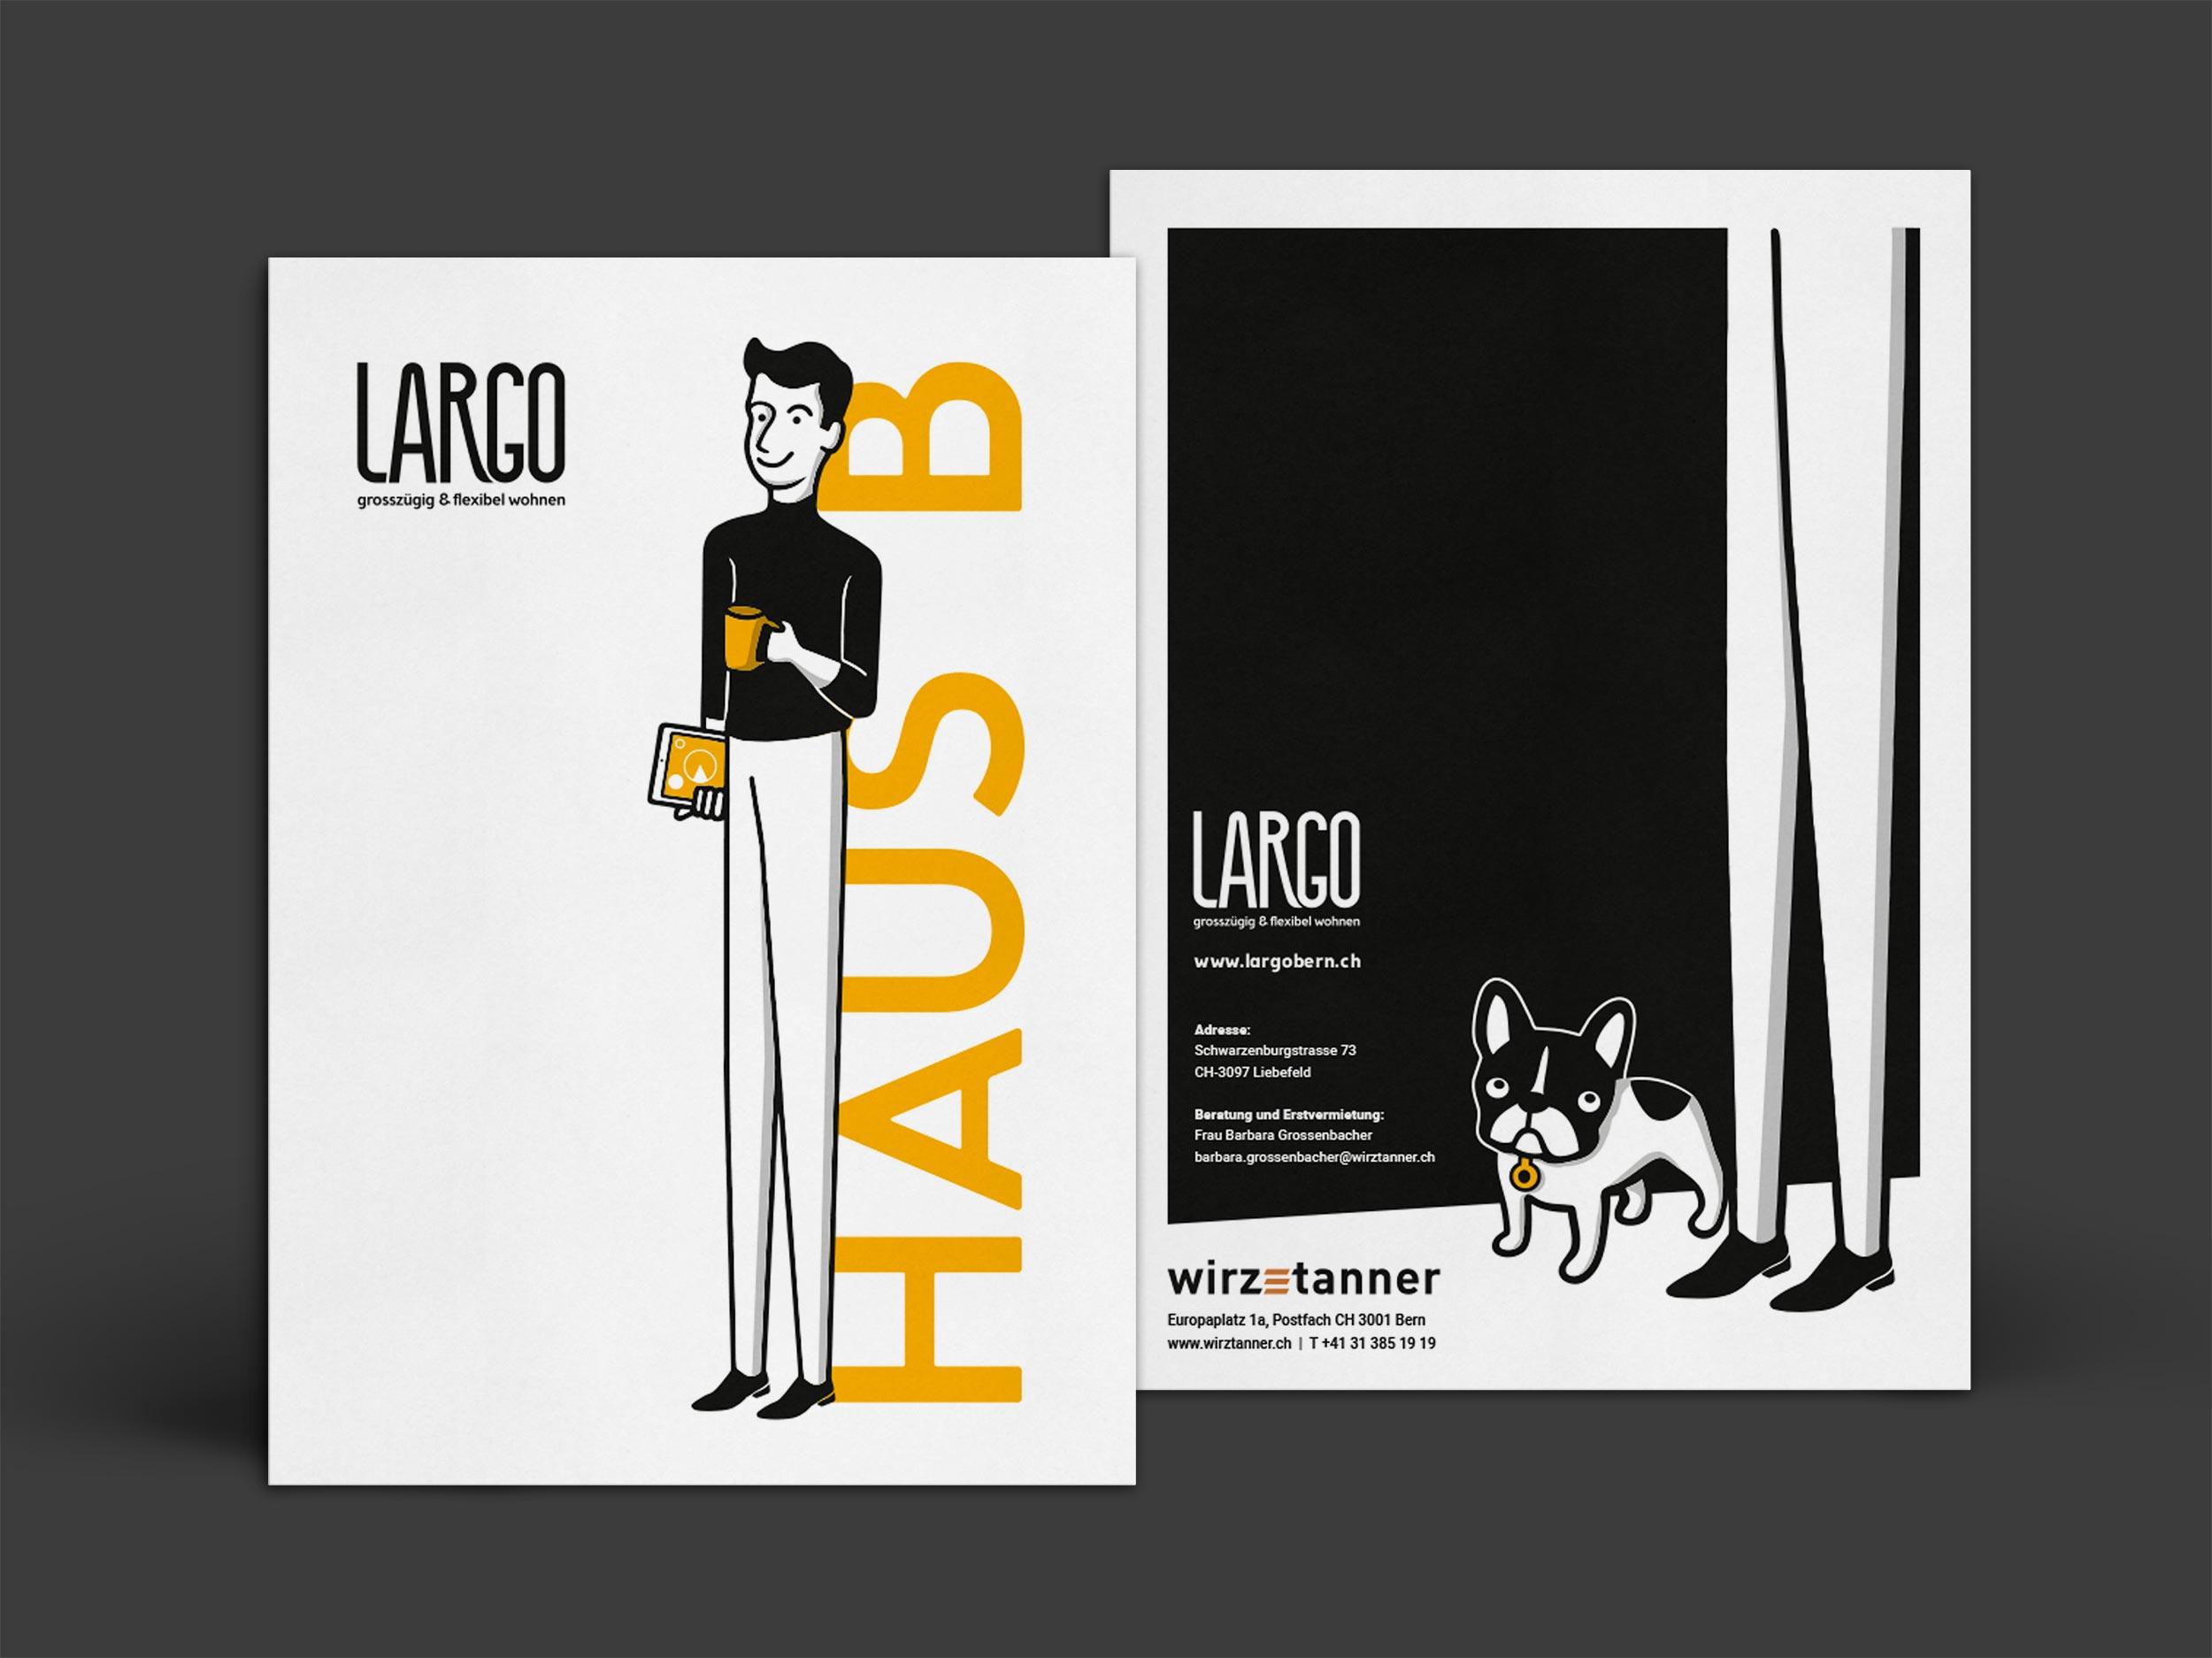 LARGO brochure cover by GPU Design